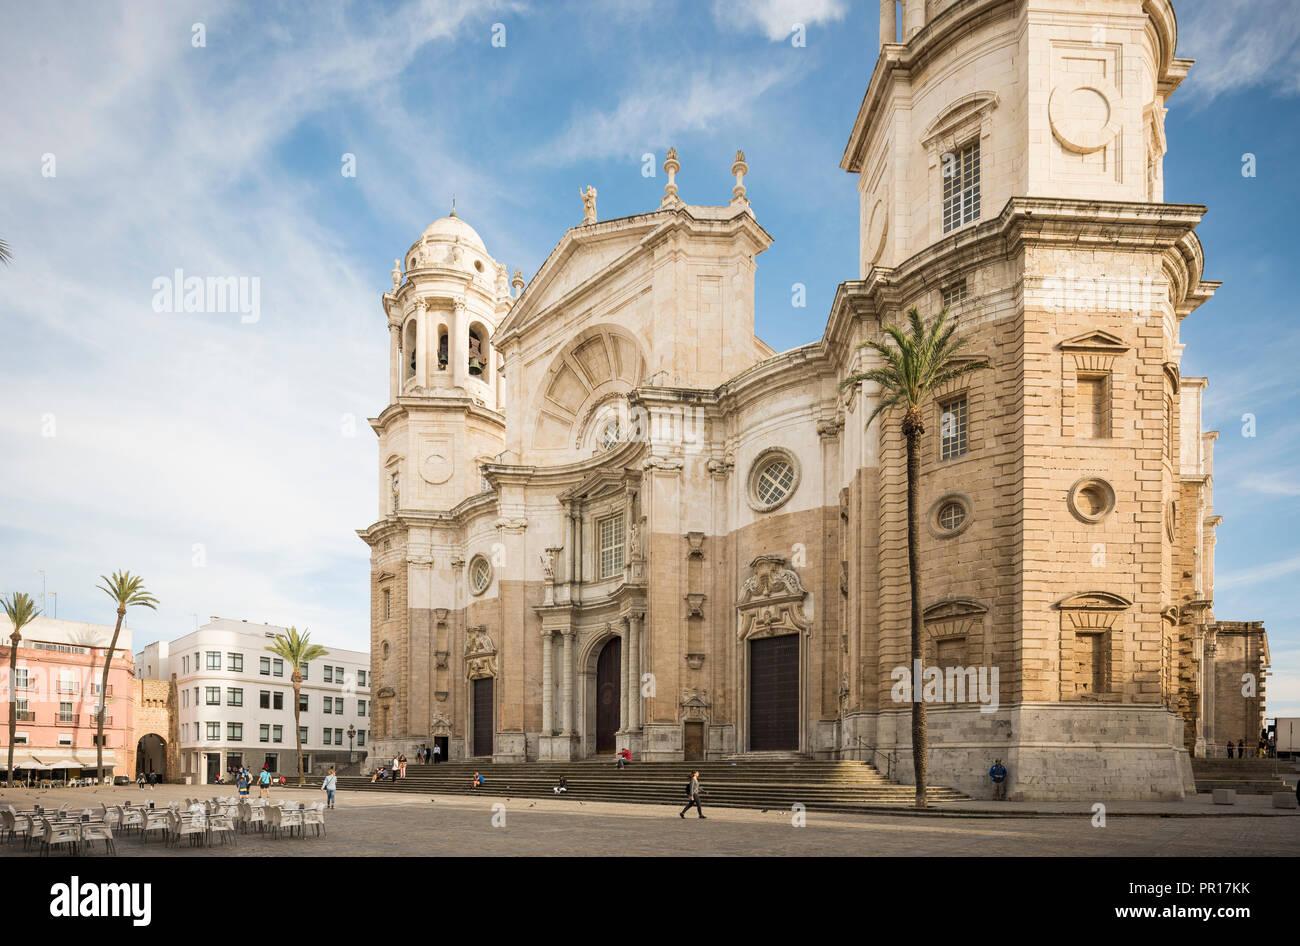 Fassade der Kathedrale, Cadiz, Andalusien, Spanien, Europa Stockbild